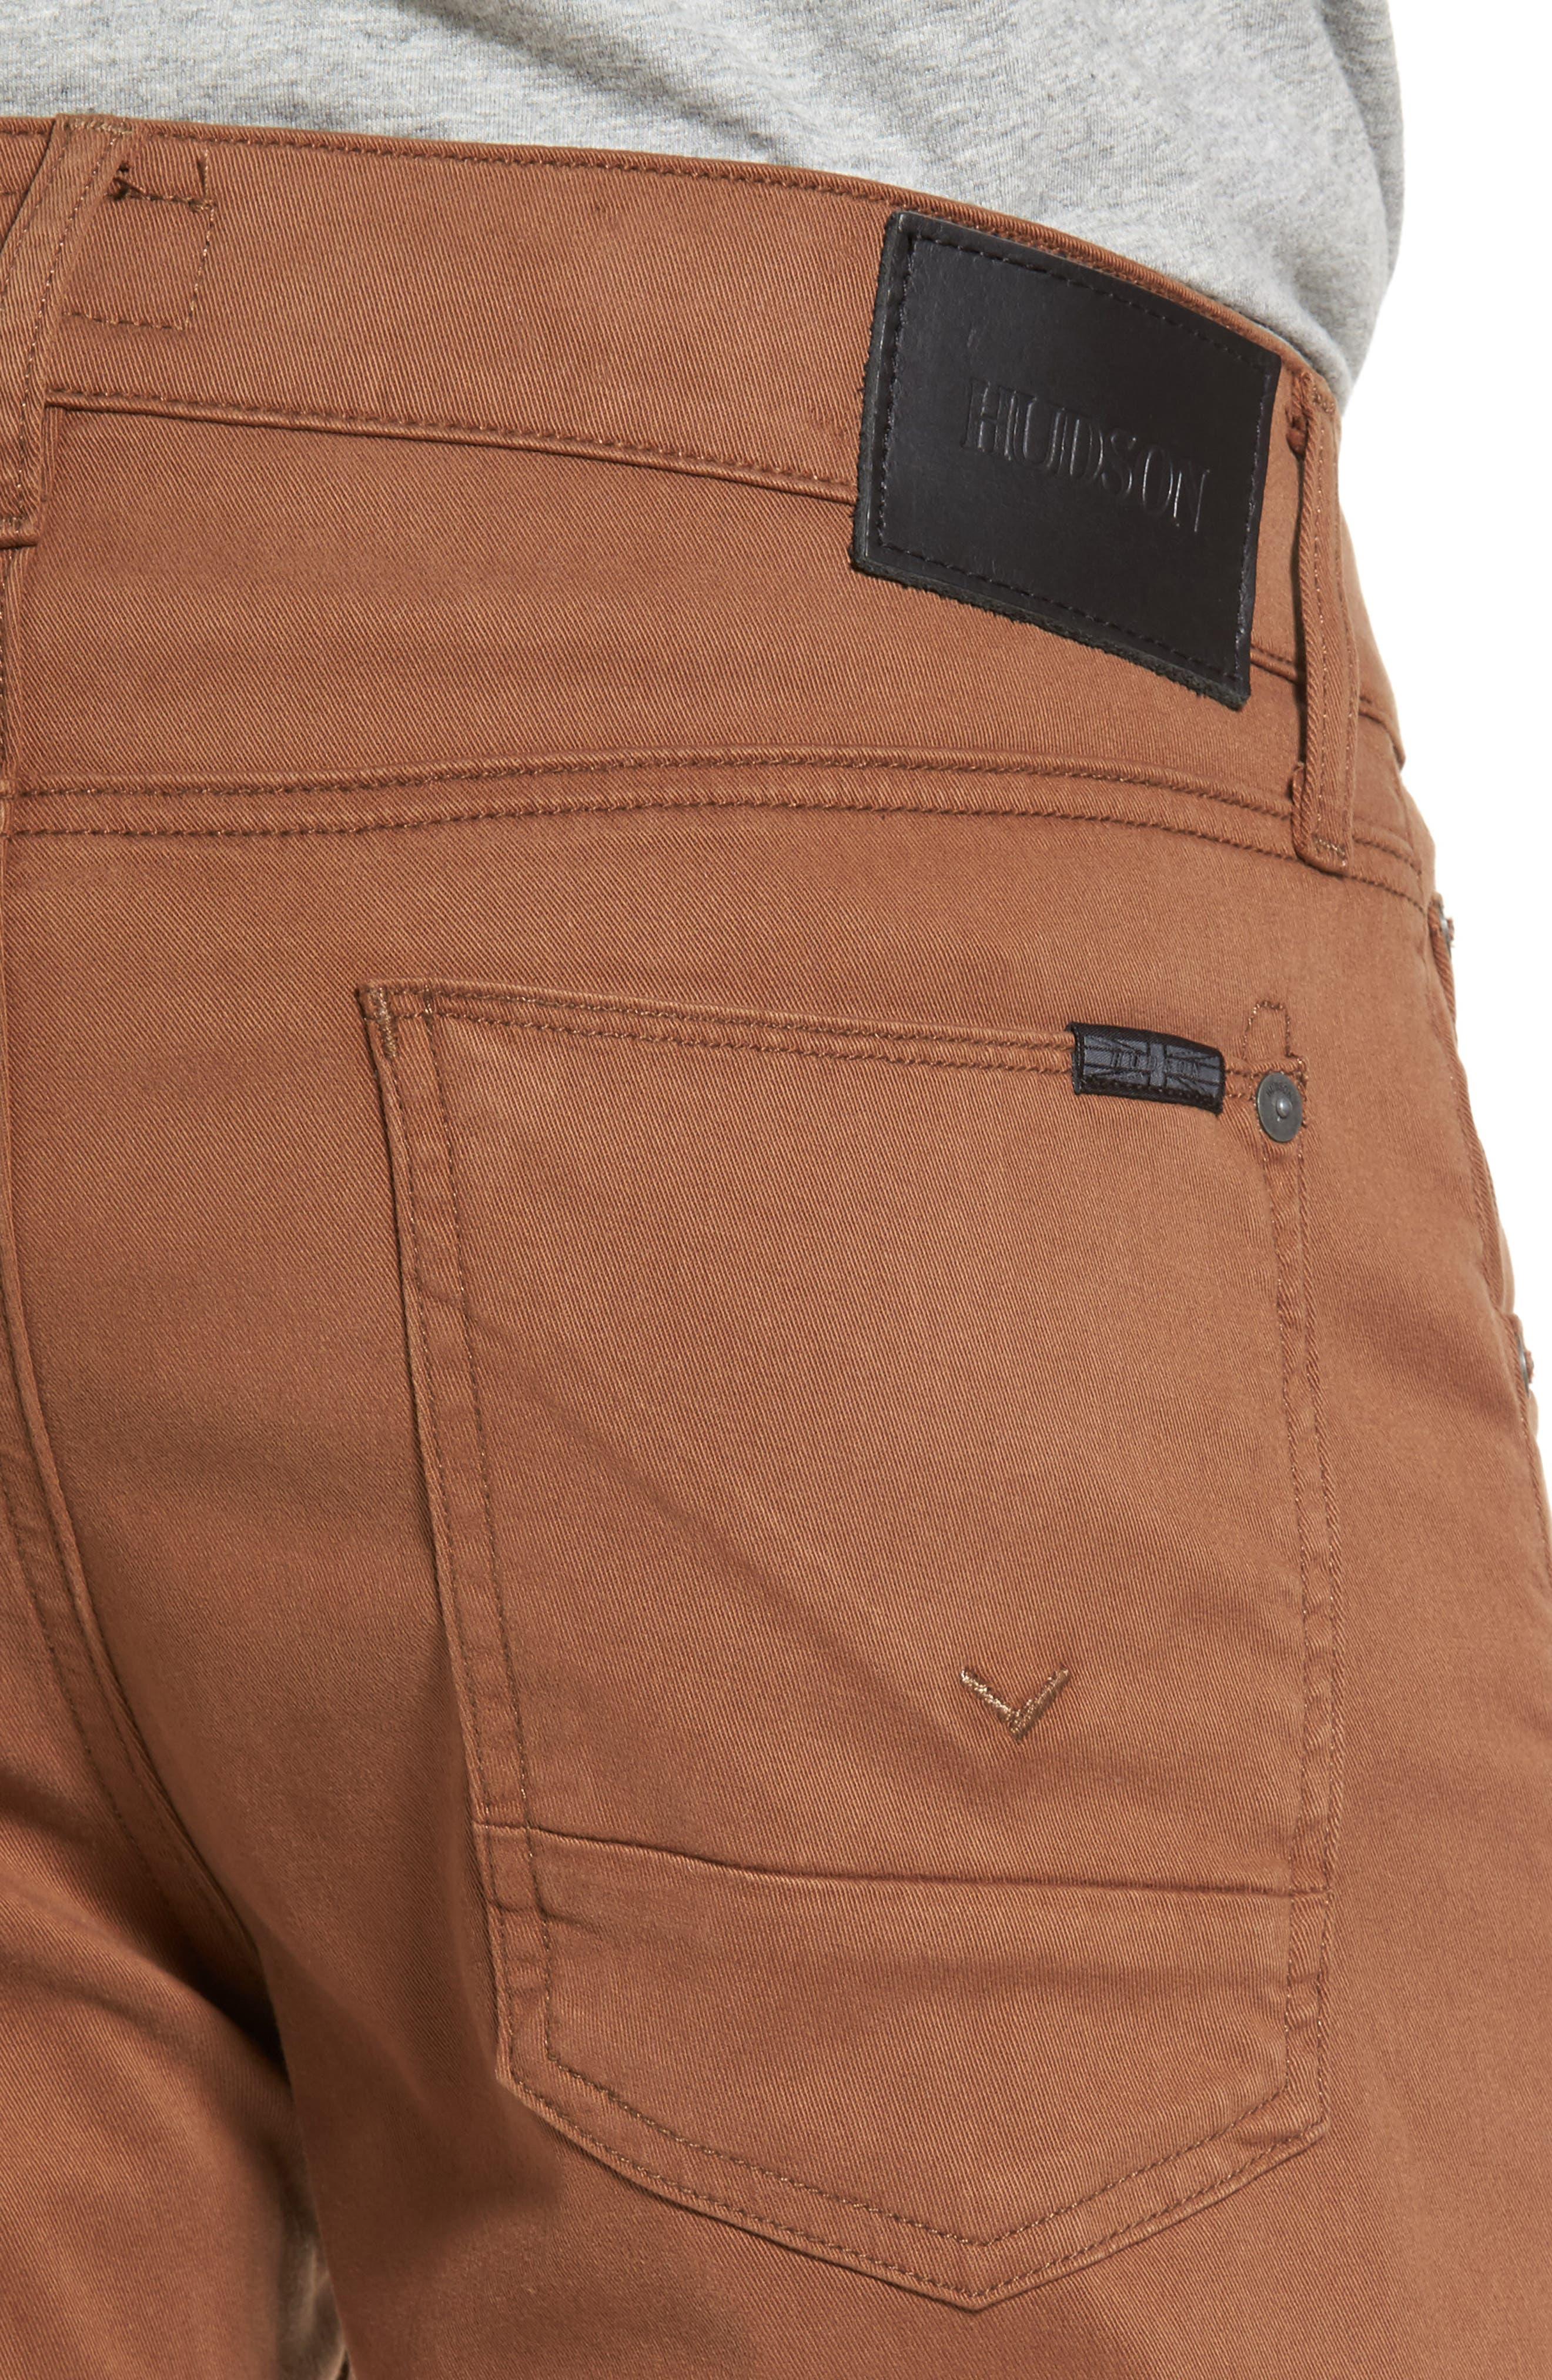 Alternate Image 4  - Hudson Jeans Blake Slim Fit Jeans (Masonite)